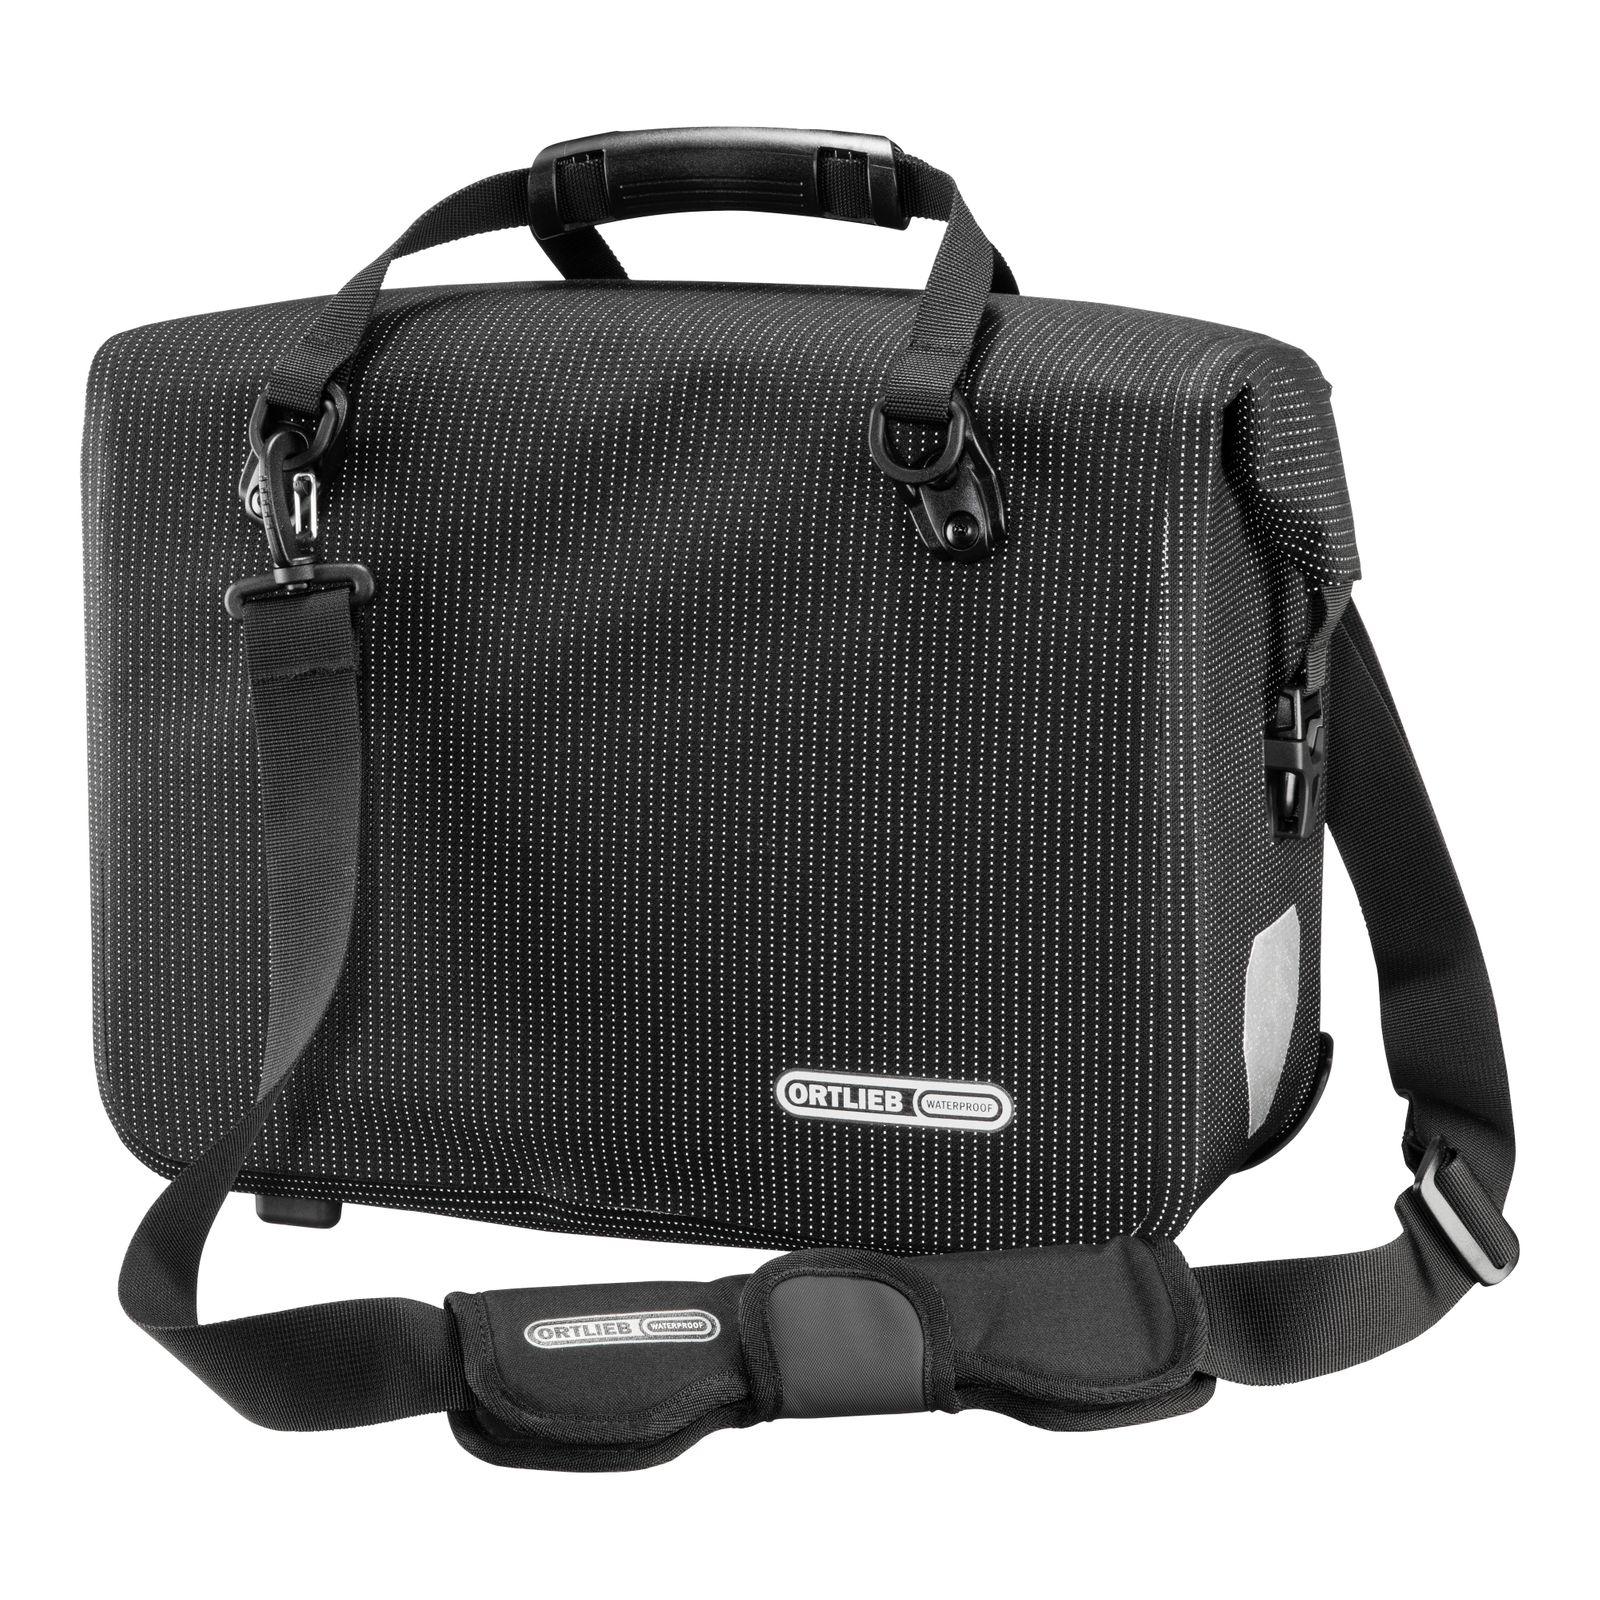 ORTLIEB High Visibility Office Bag Bike Side Pannier (QL2.1) 21L - Single Black Reflective